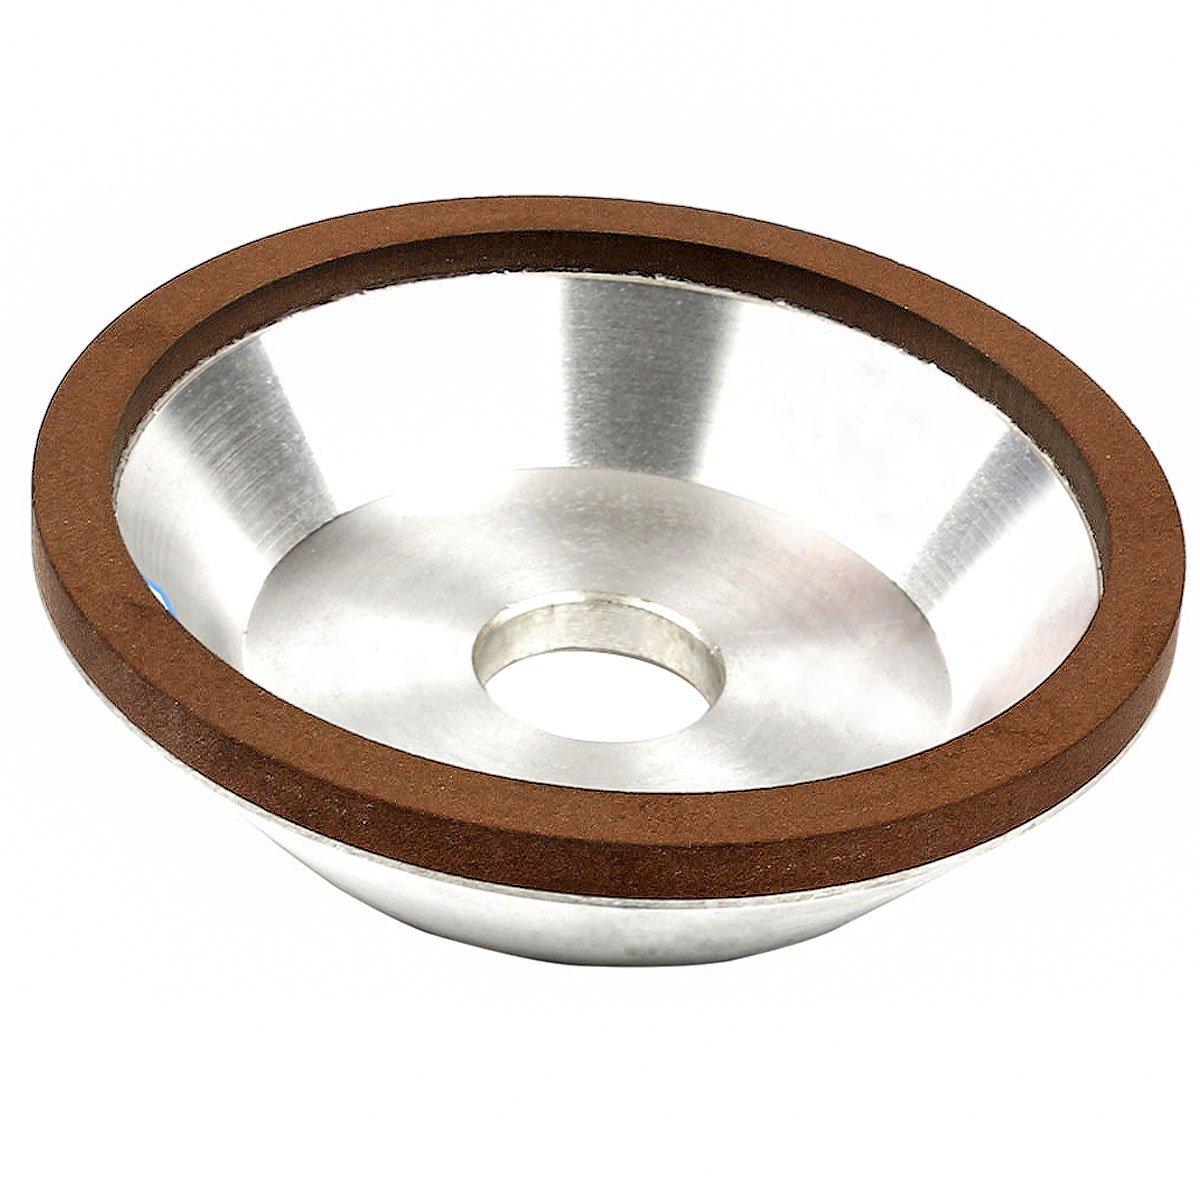 Kuntemu Diamond Grinding Wheel Grinding Disc 125x32x32x10x3 Mill Sharpening Grinding Wheel Rotary Abrasive Tools